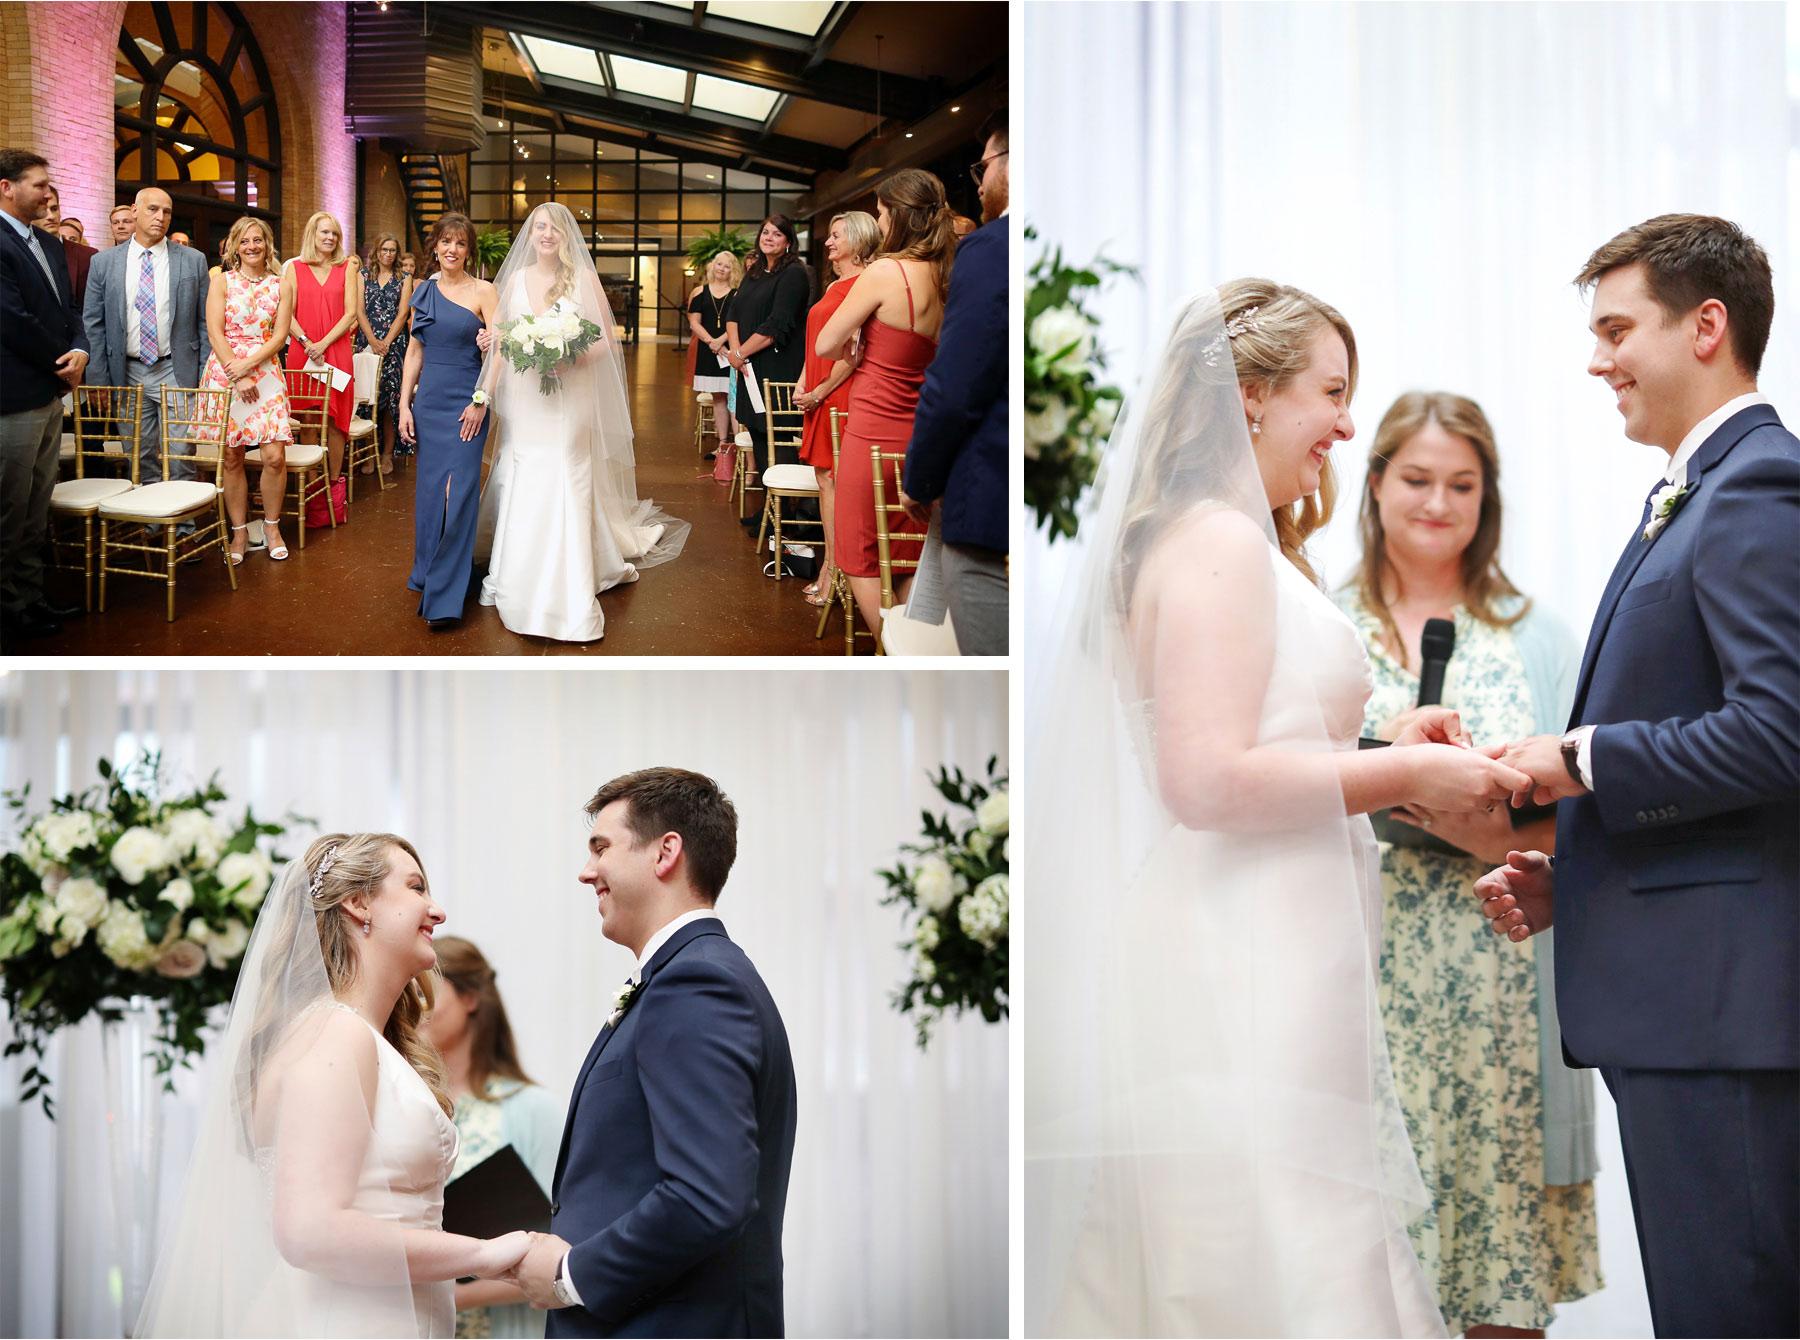 15-Minneapolis-Minnesota-Wedding-Vick-Photography-The-Depot-Ceremony-Amelia-and-Alexander.jpg